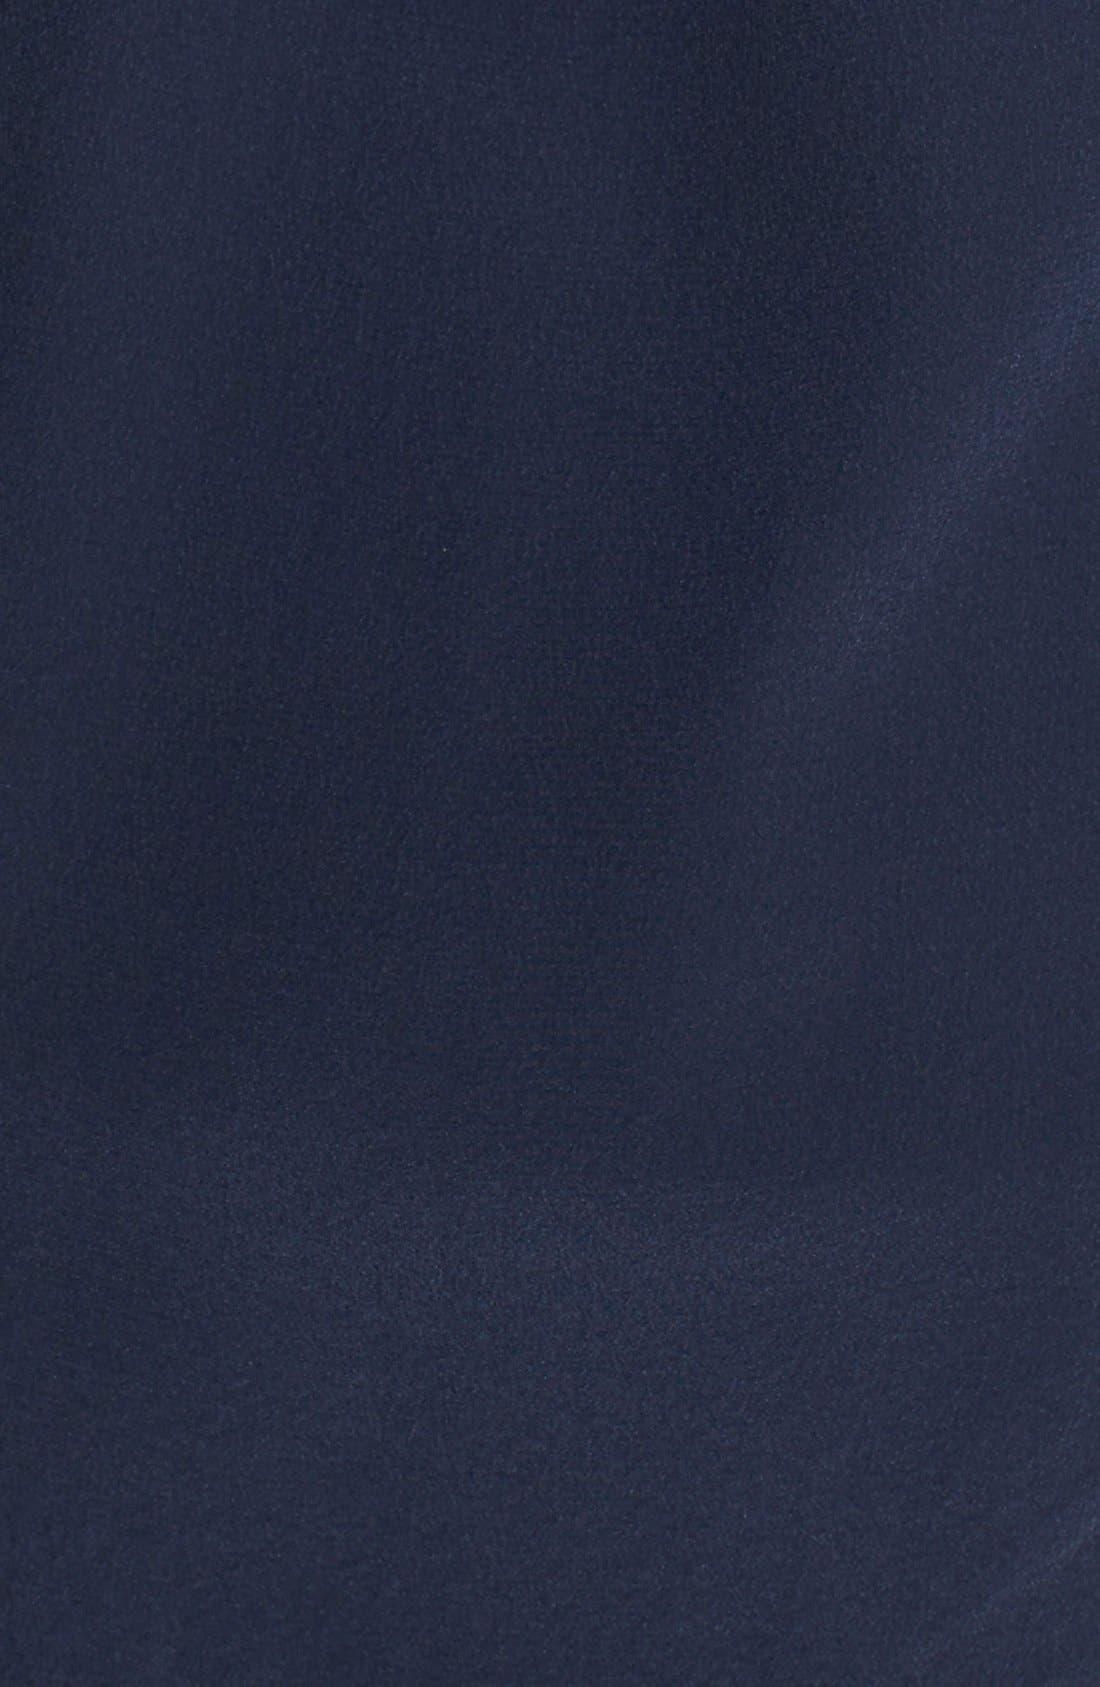 London Silk Maternity Tunic,                             Alternate thumbnail 4, color,